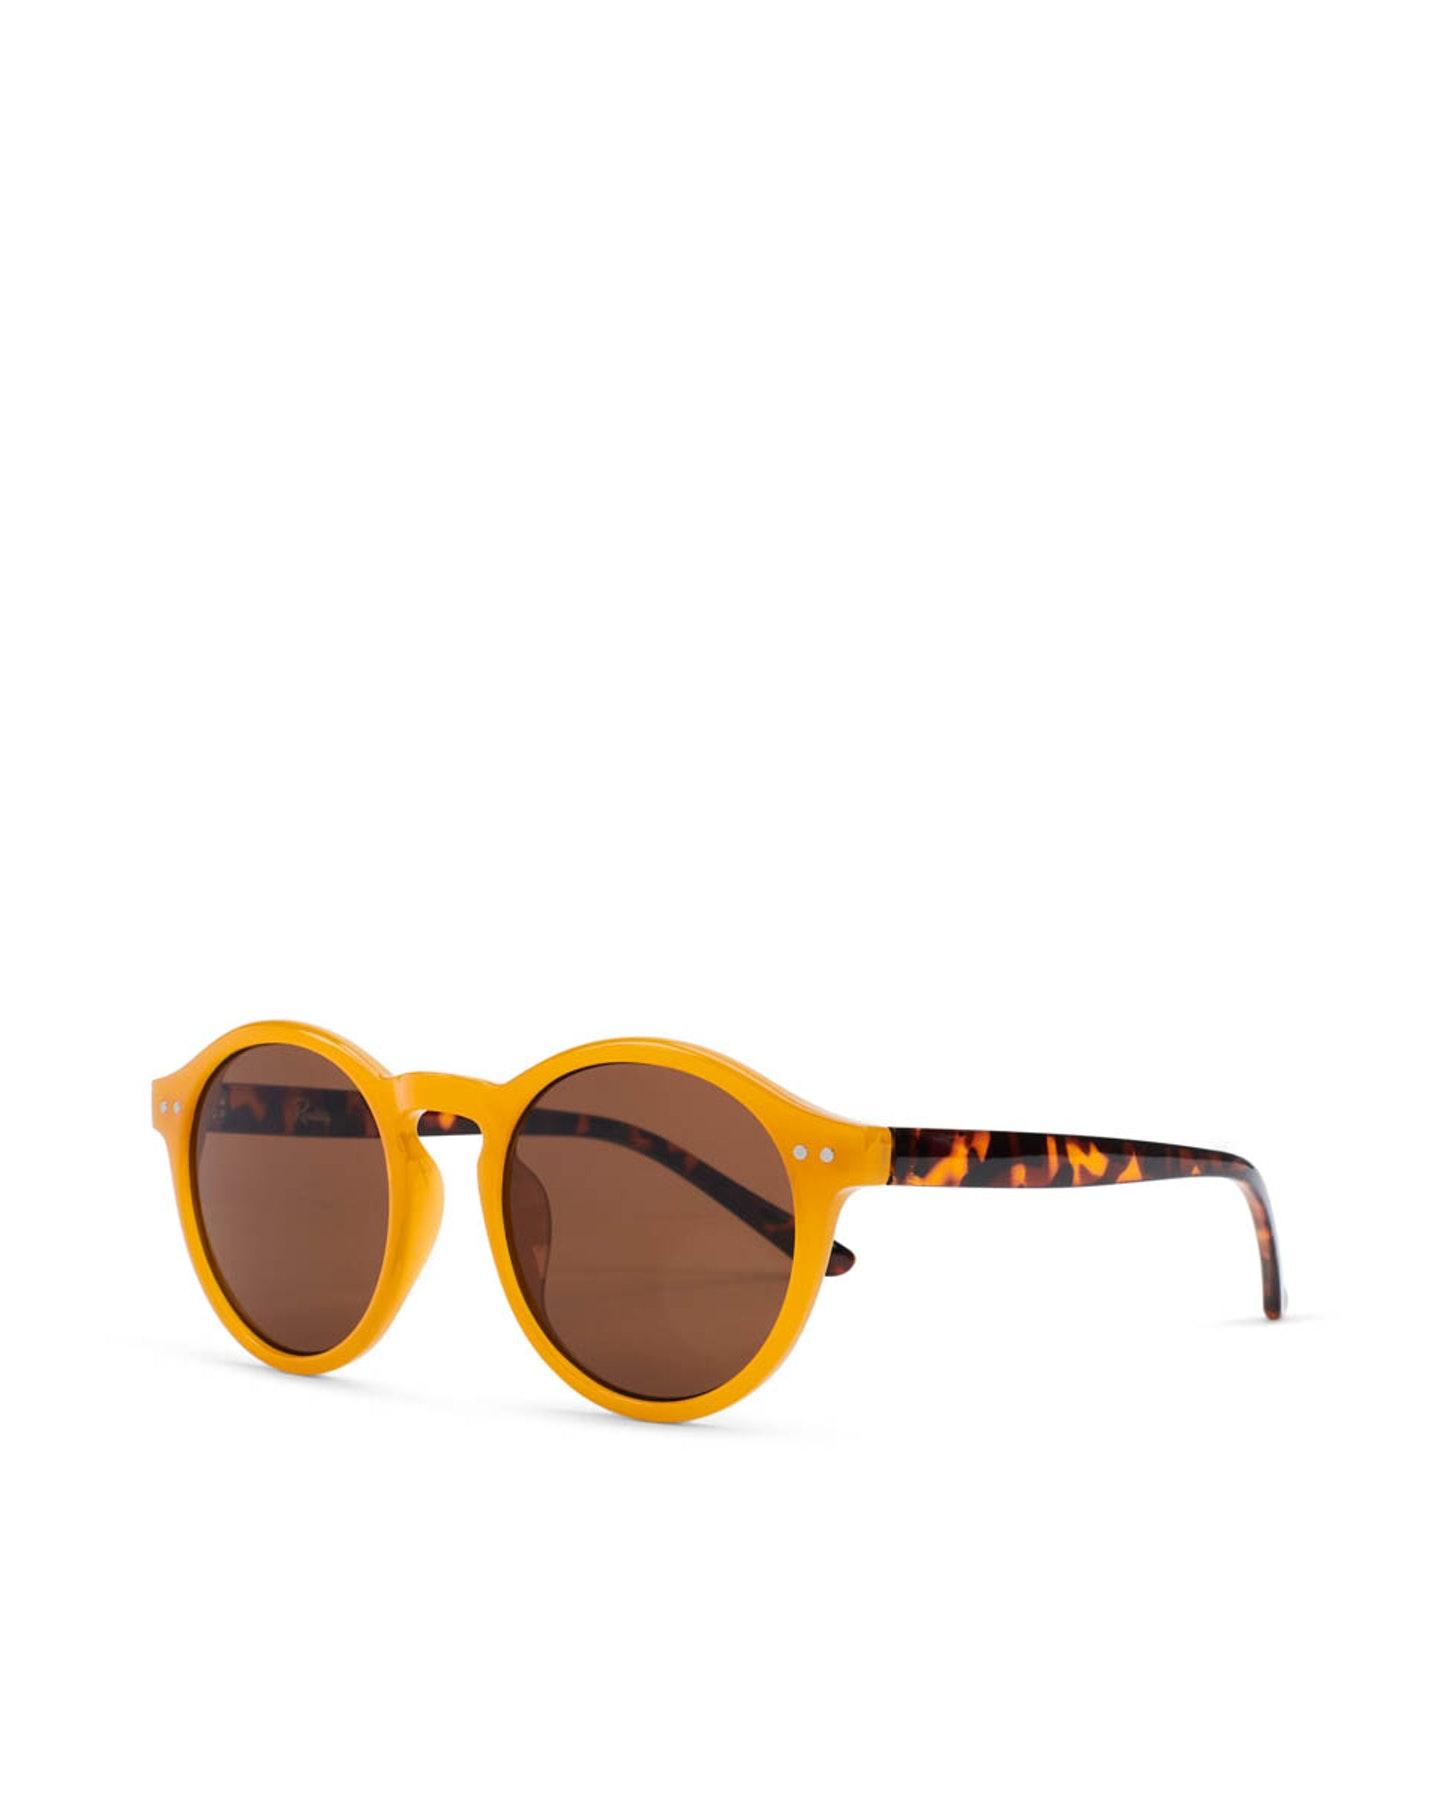 Reality Eyewear Hudson Sunglasses Mustard Mustard